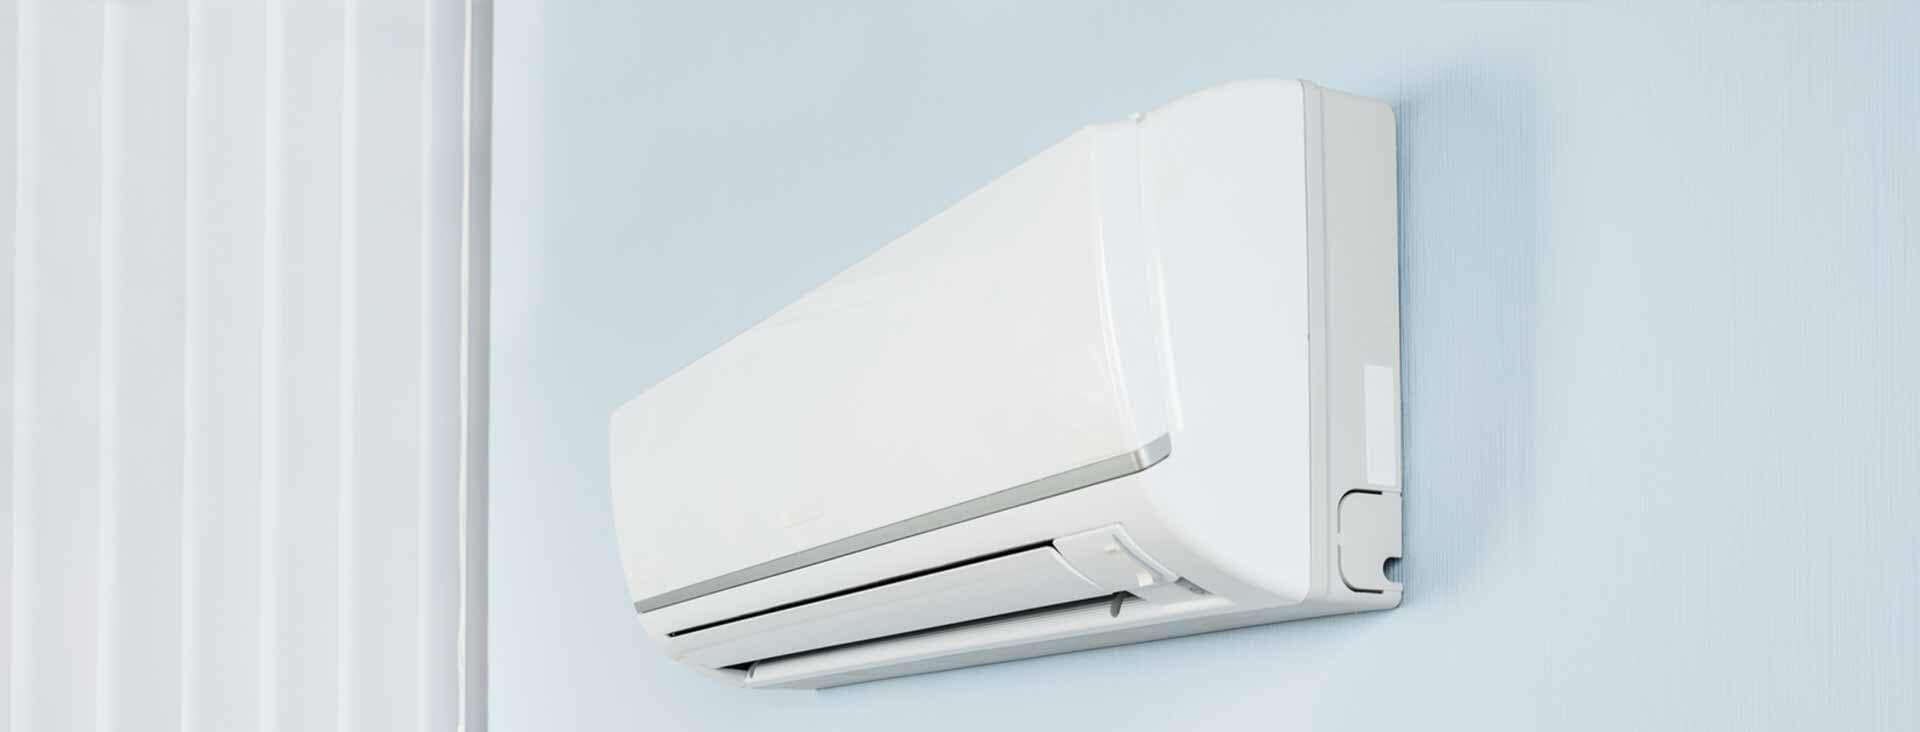 Air Express Heating & Air Conditioning image 8